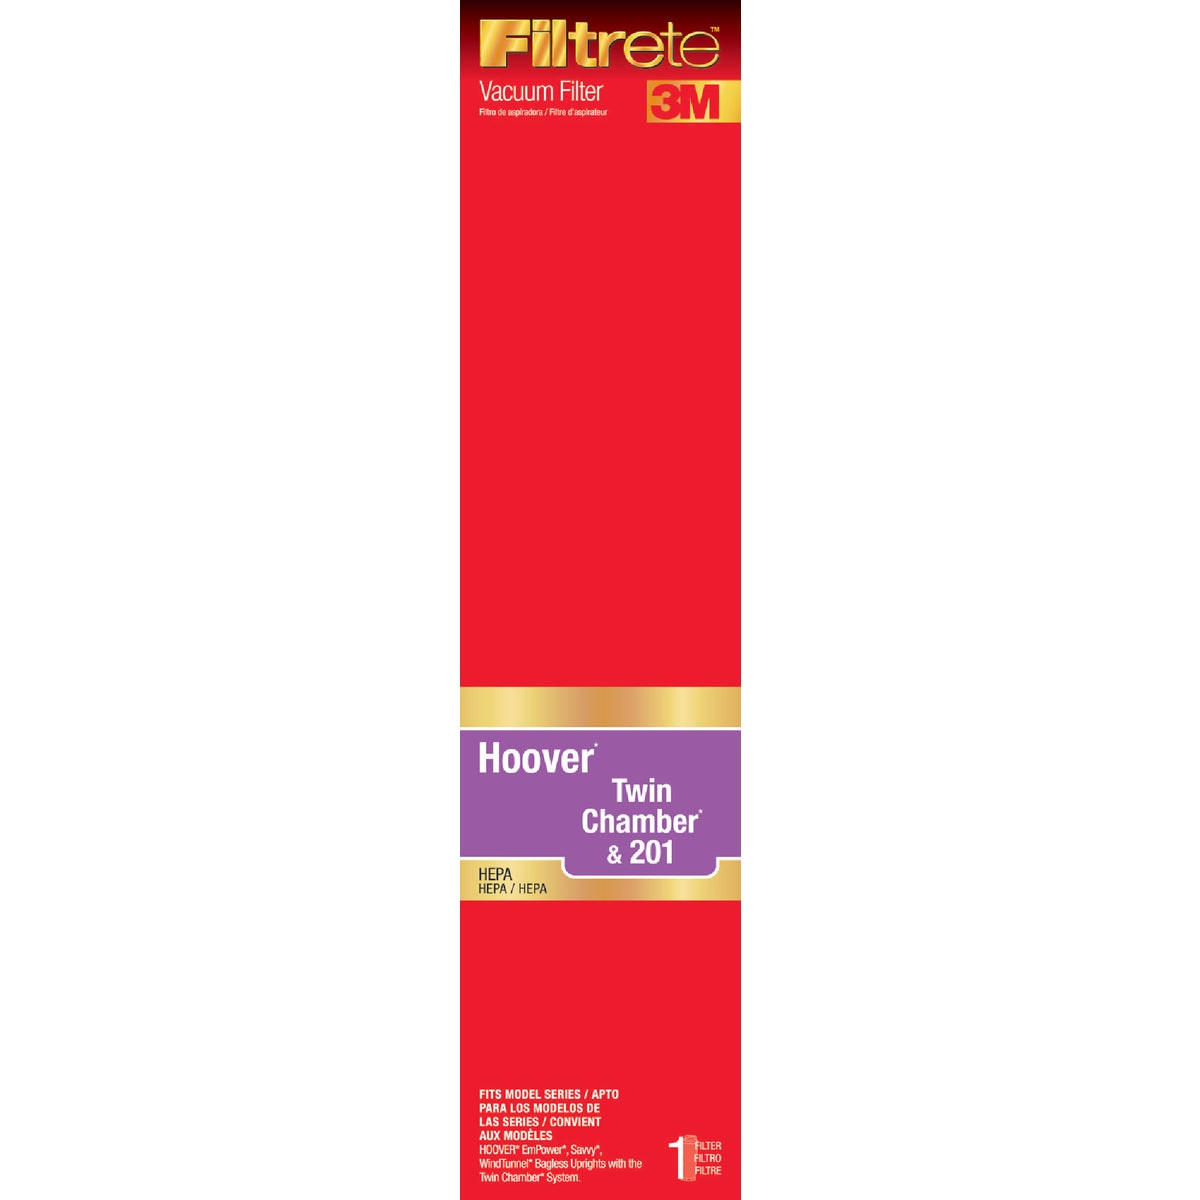 Hoover HEPA Vacuum Filter, 64805B-2